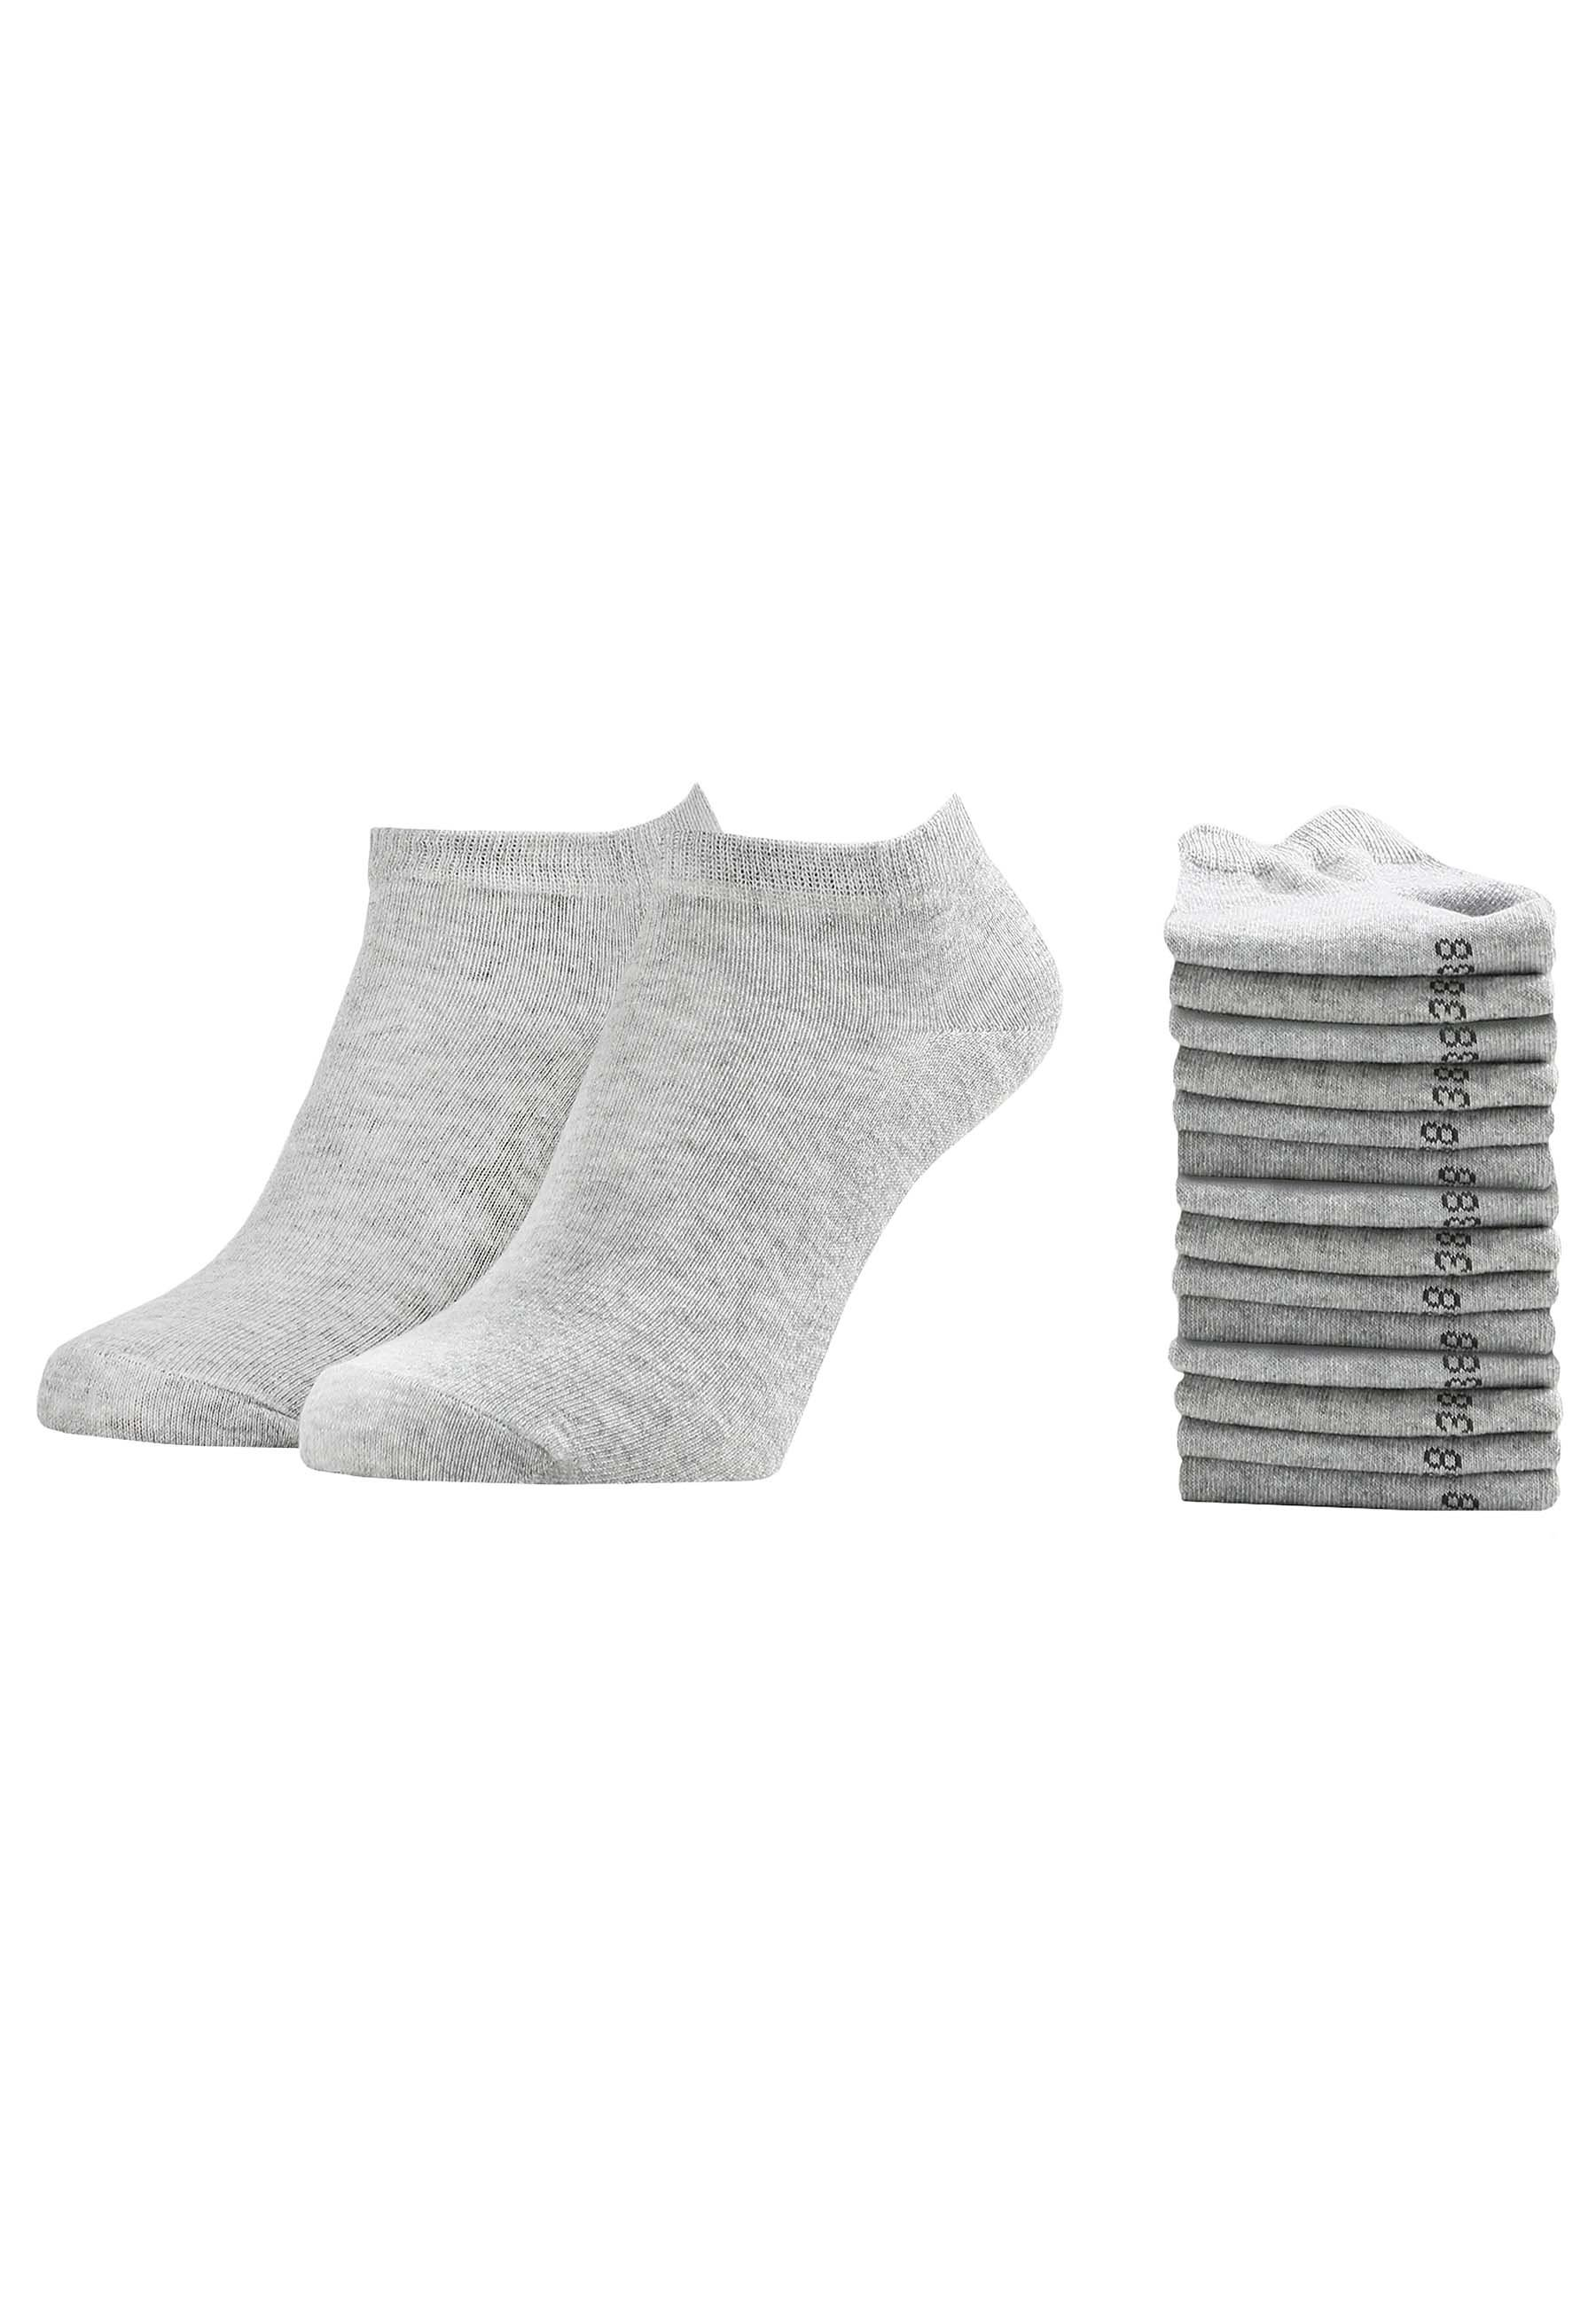 Femme 15er Pack - Chaussettes